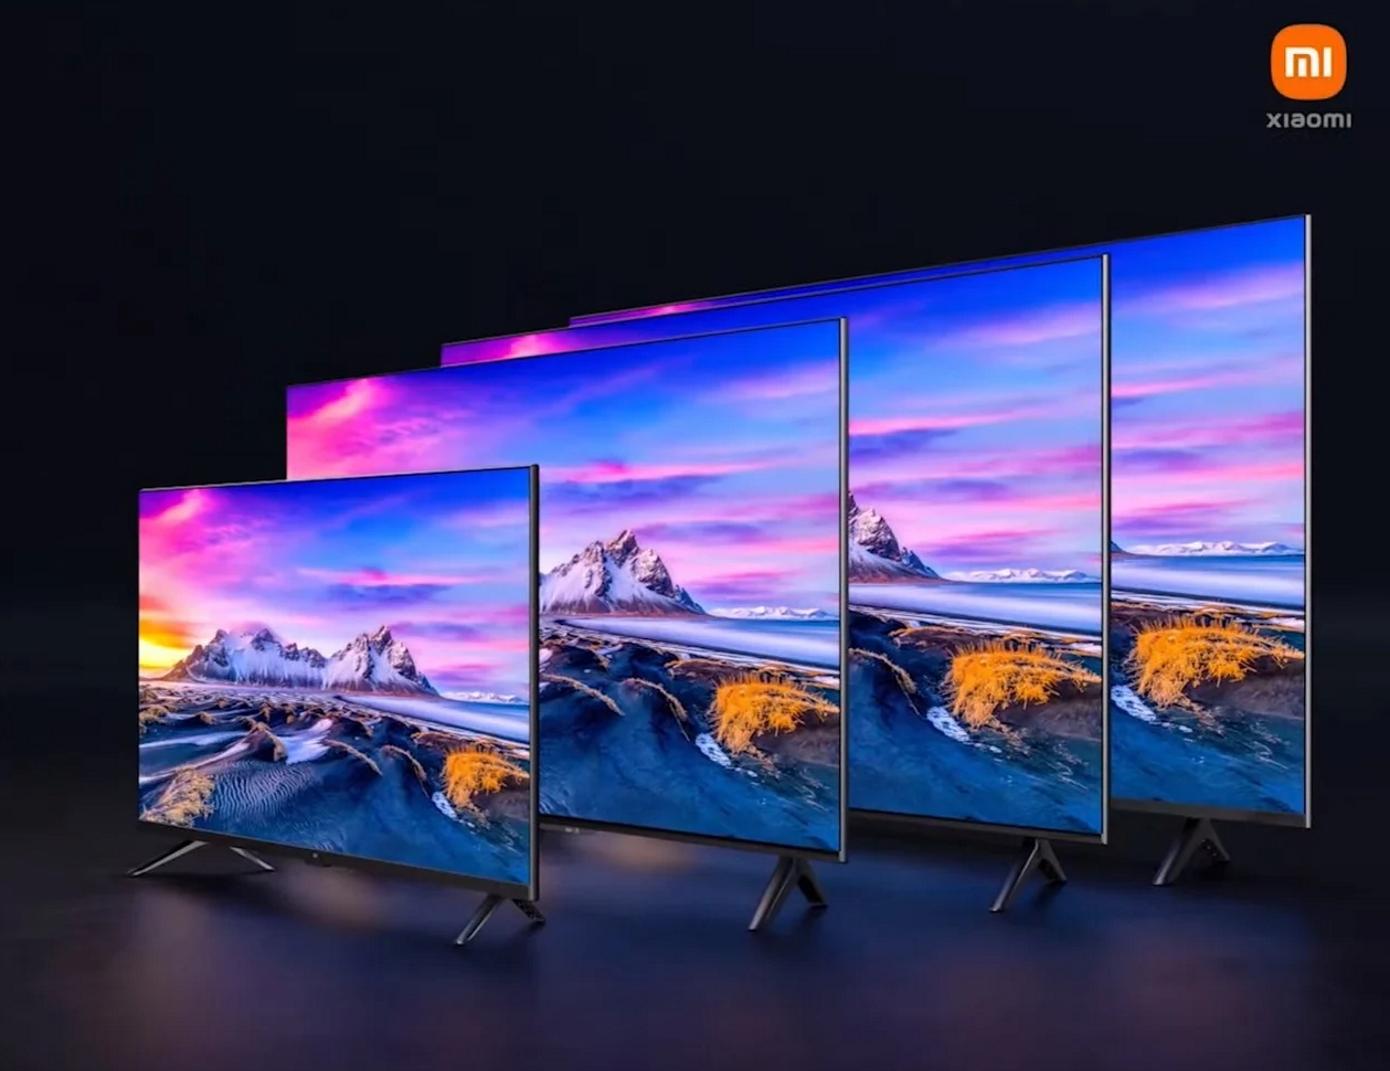 Xiaomi Vypustila Linejku Mi Tv P1 1